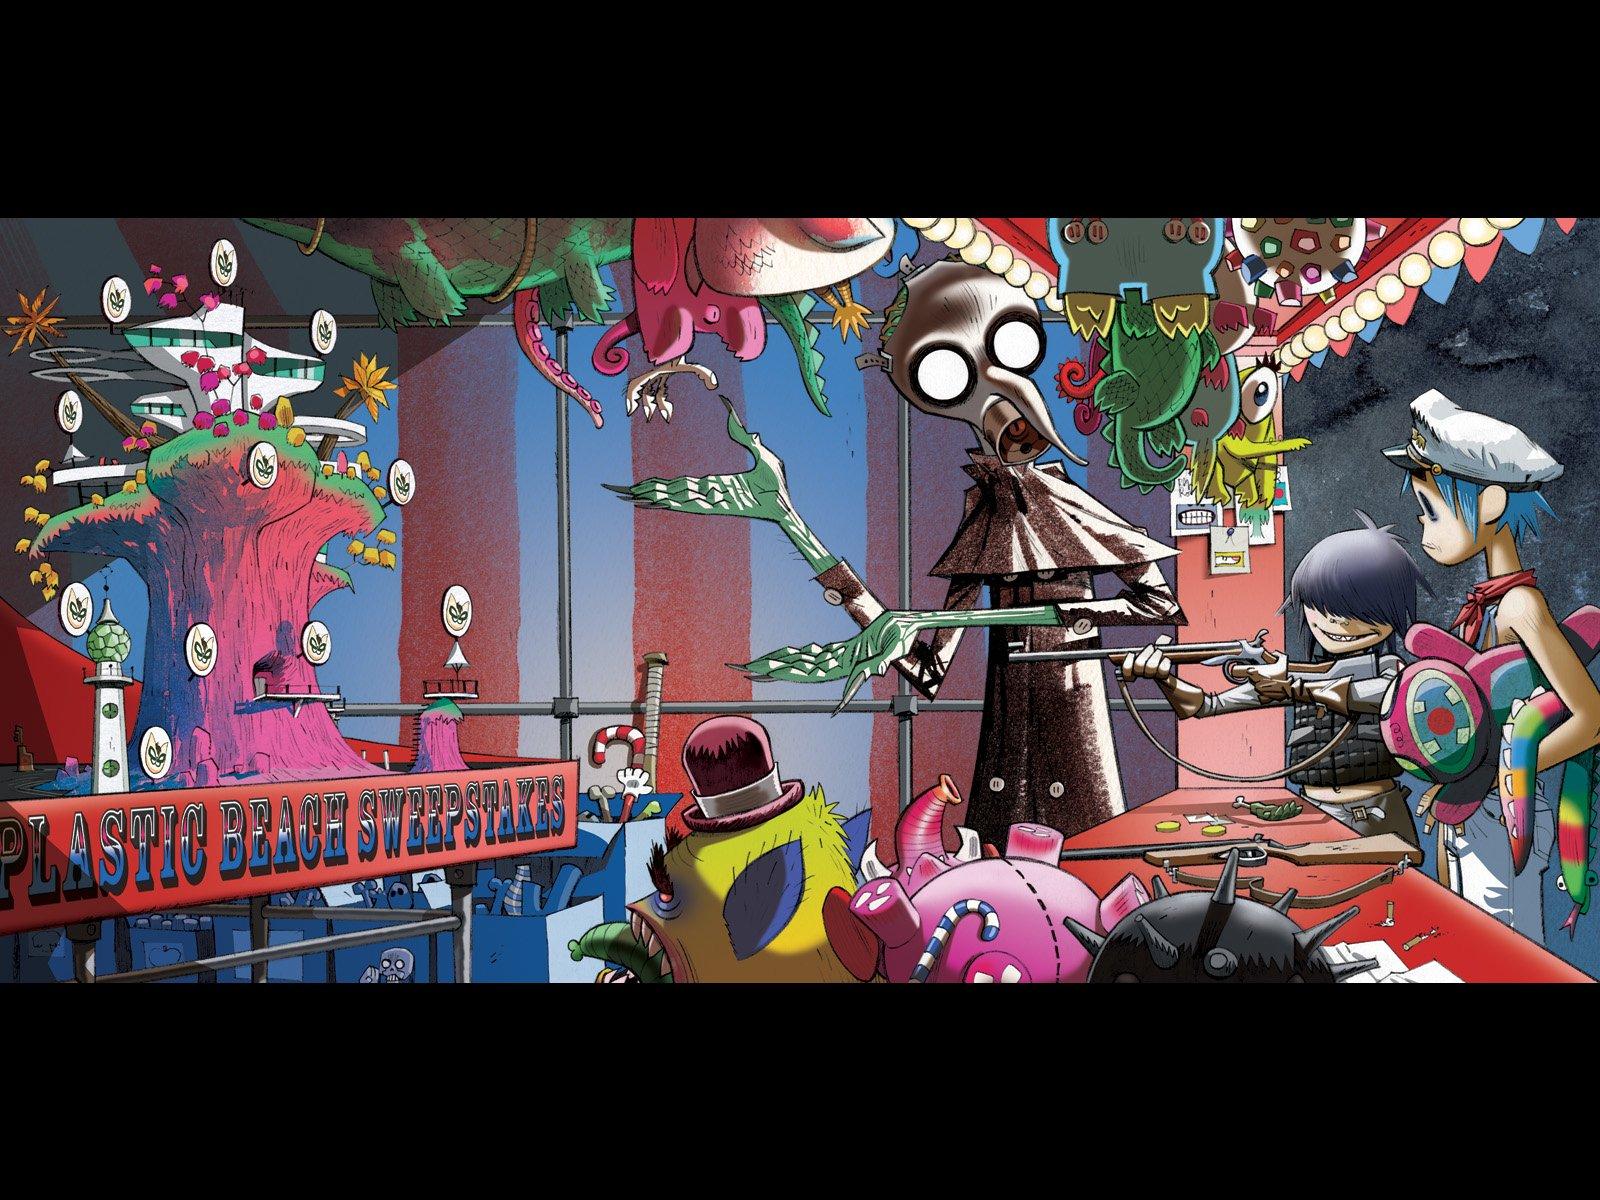 Gorillaz Iphone Wallpaper Gorillaz Wallpaper And Background Image 1600x1200 Id